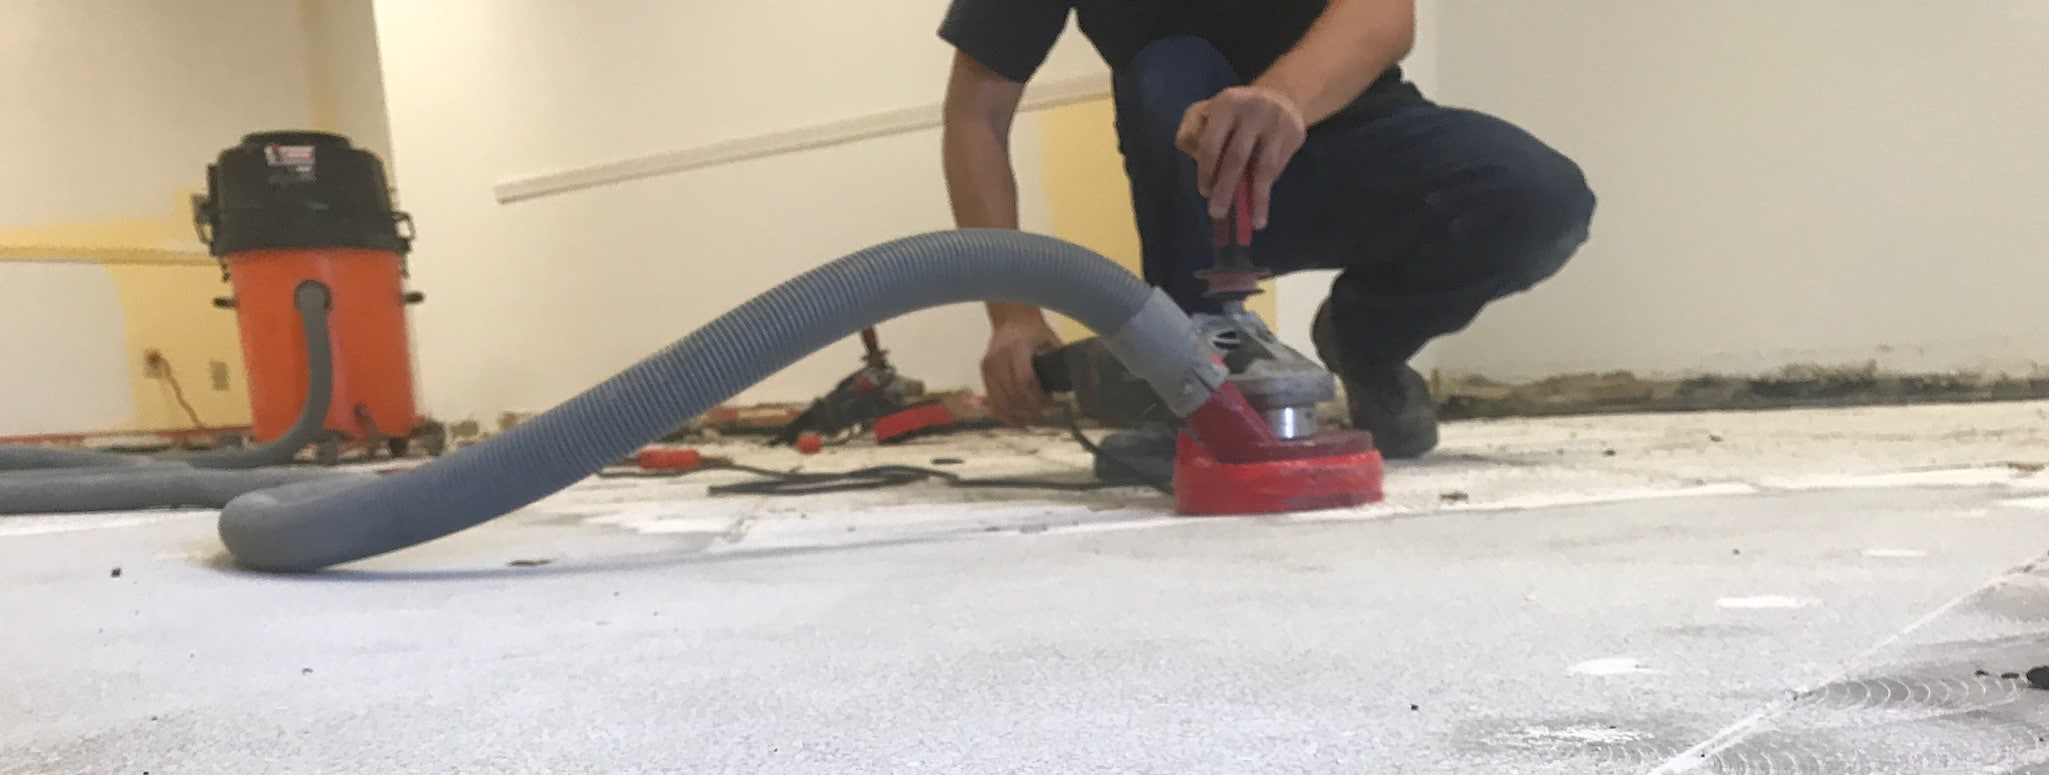 Image of sub-floor preparation